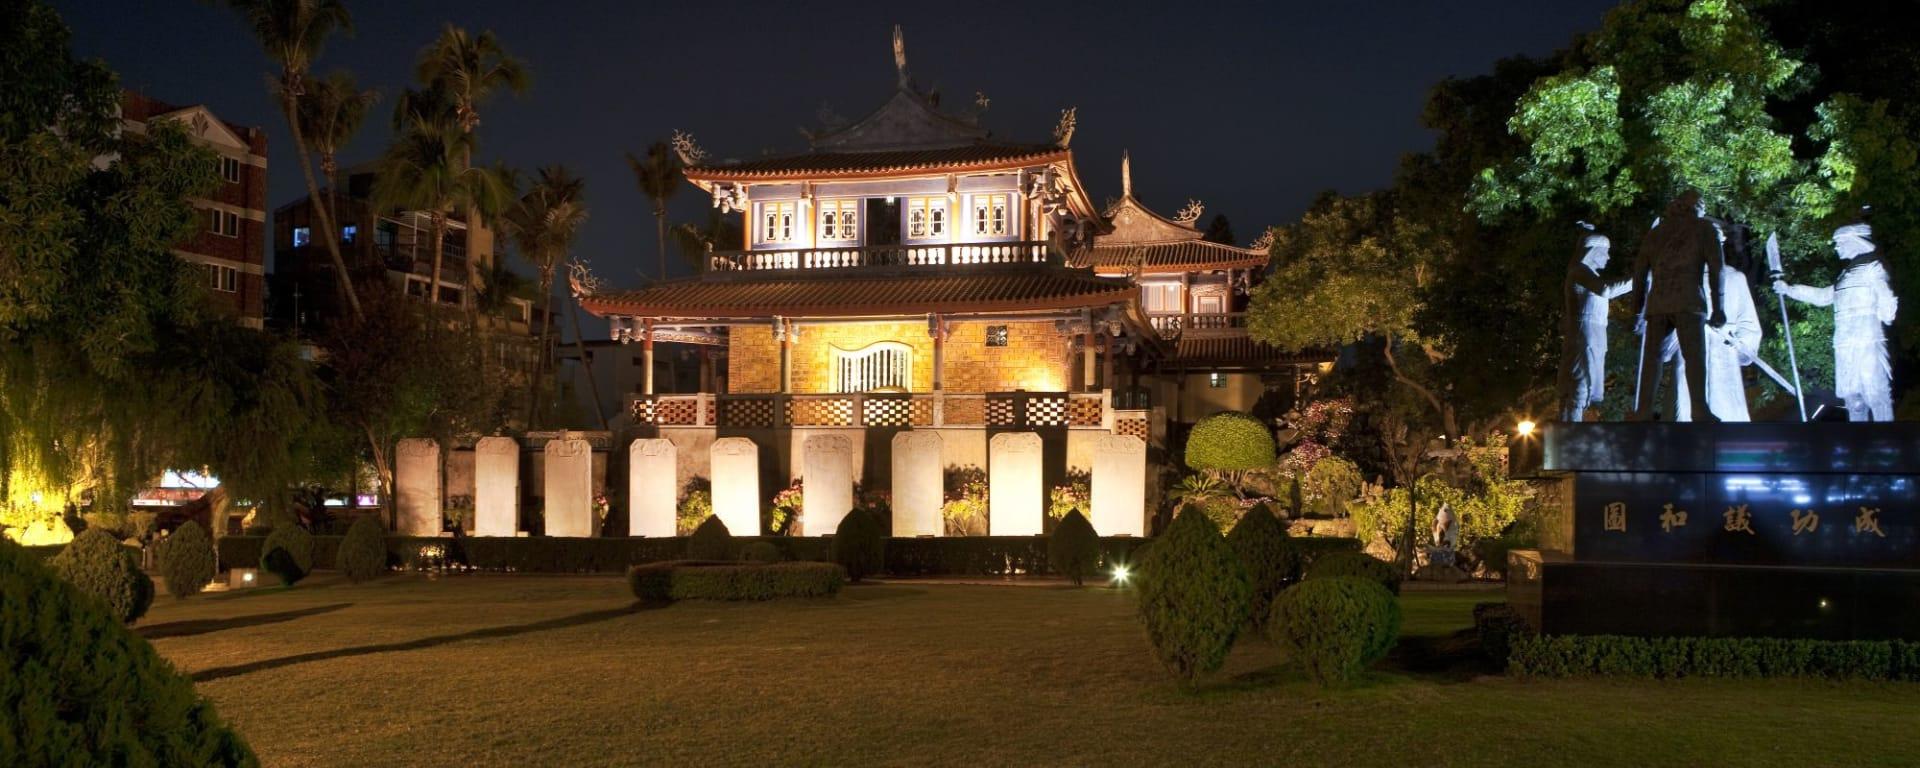 Voyages en Taïwan | Vacances en Asie par tourasia: Tainan Chikan Tower